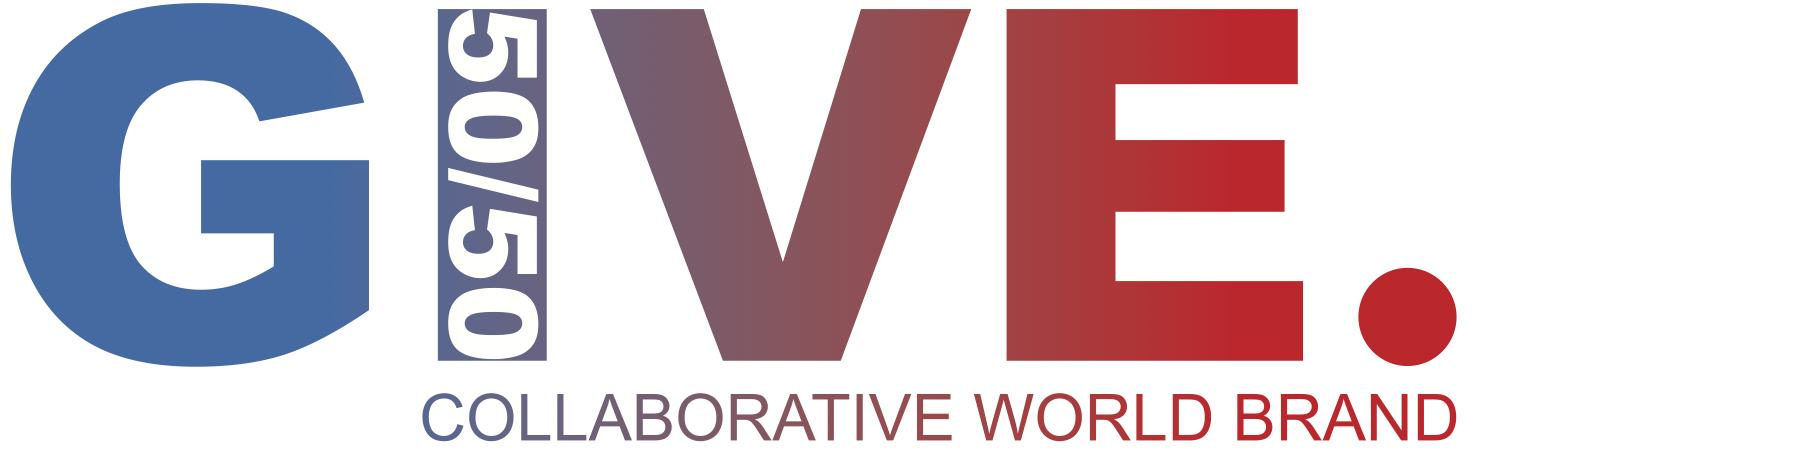 collaborative world